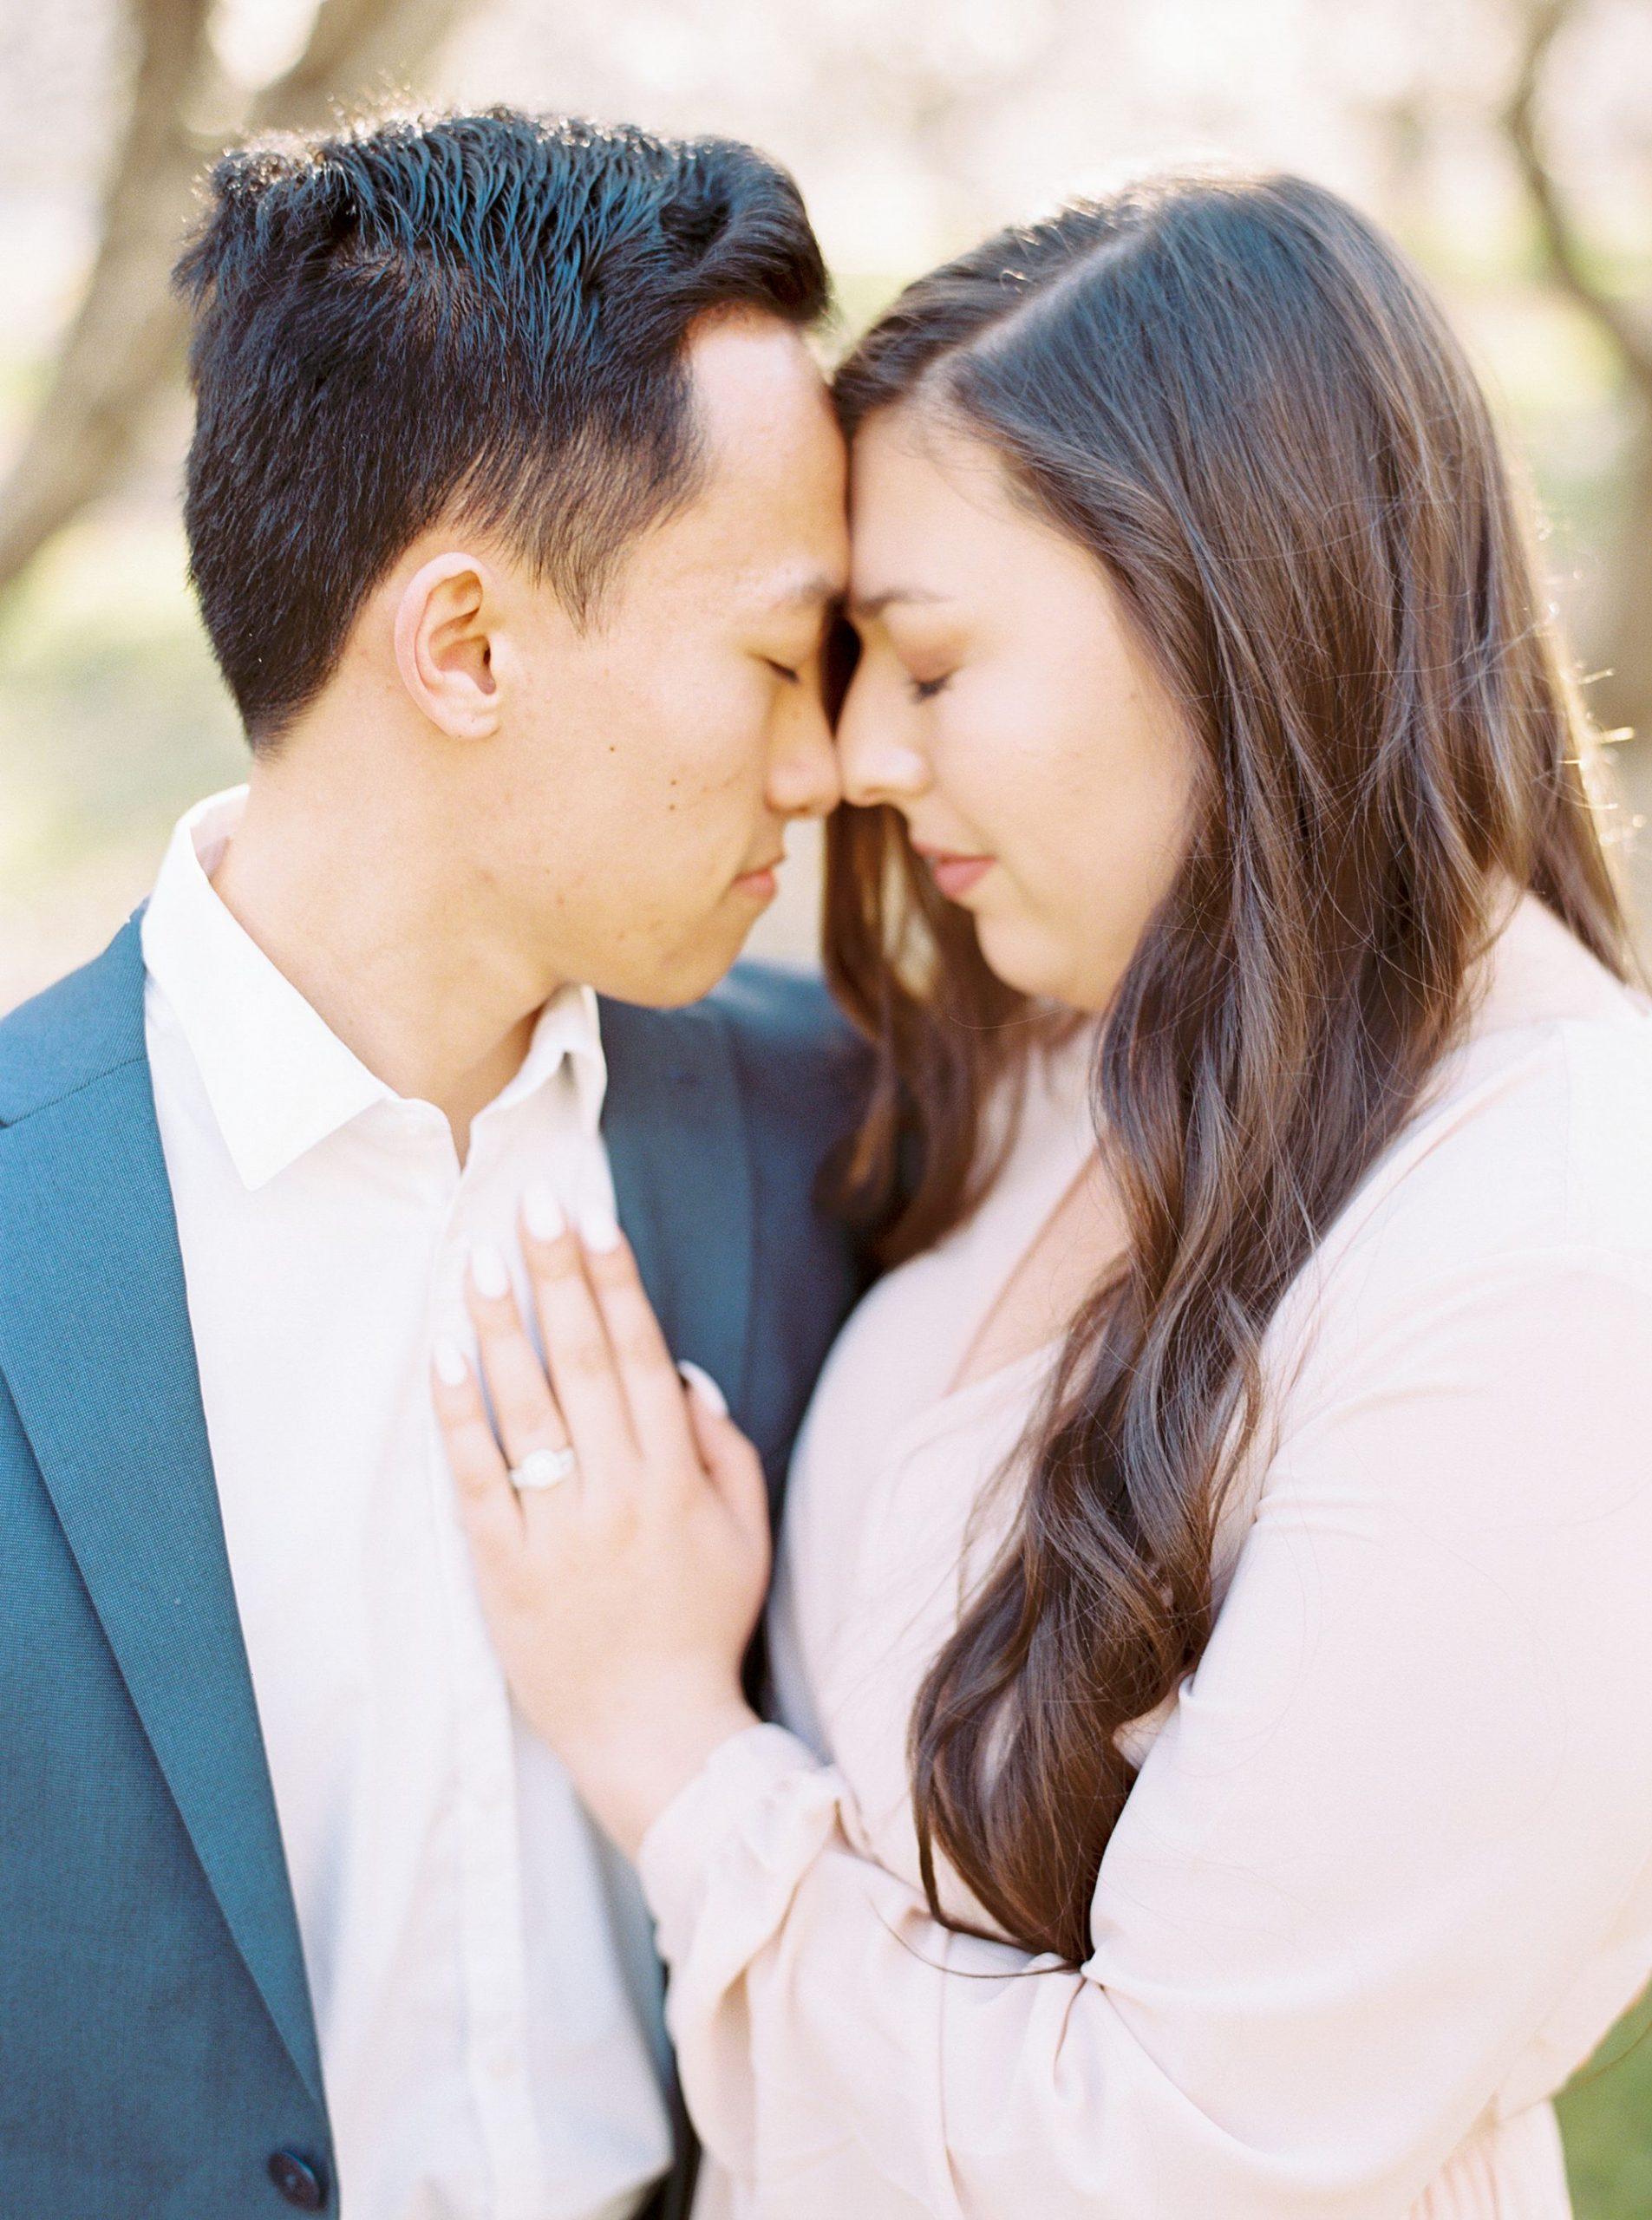 Almond Orchard Engagement Session - Caley and Tyler - Lone Oak Wedding - Ashley Baumgartner - Almond Blossom_0008.jpg